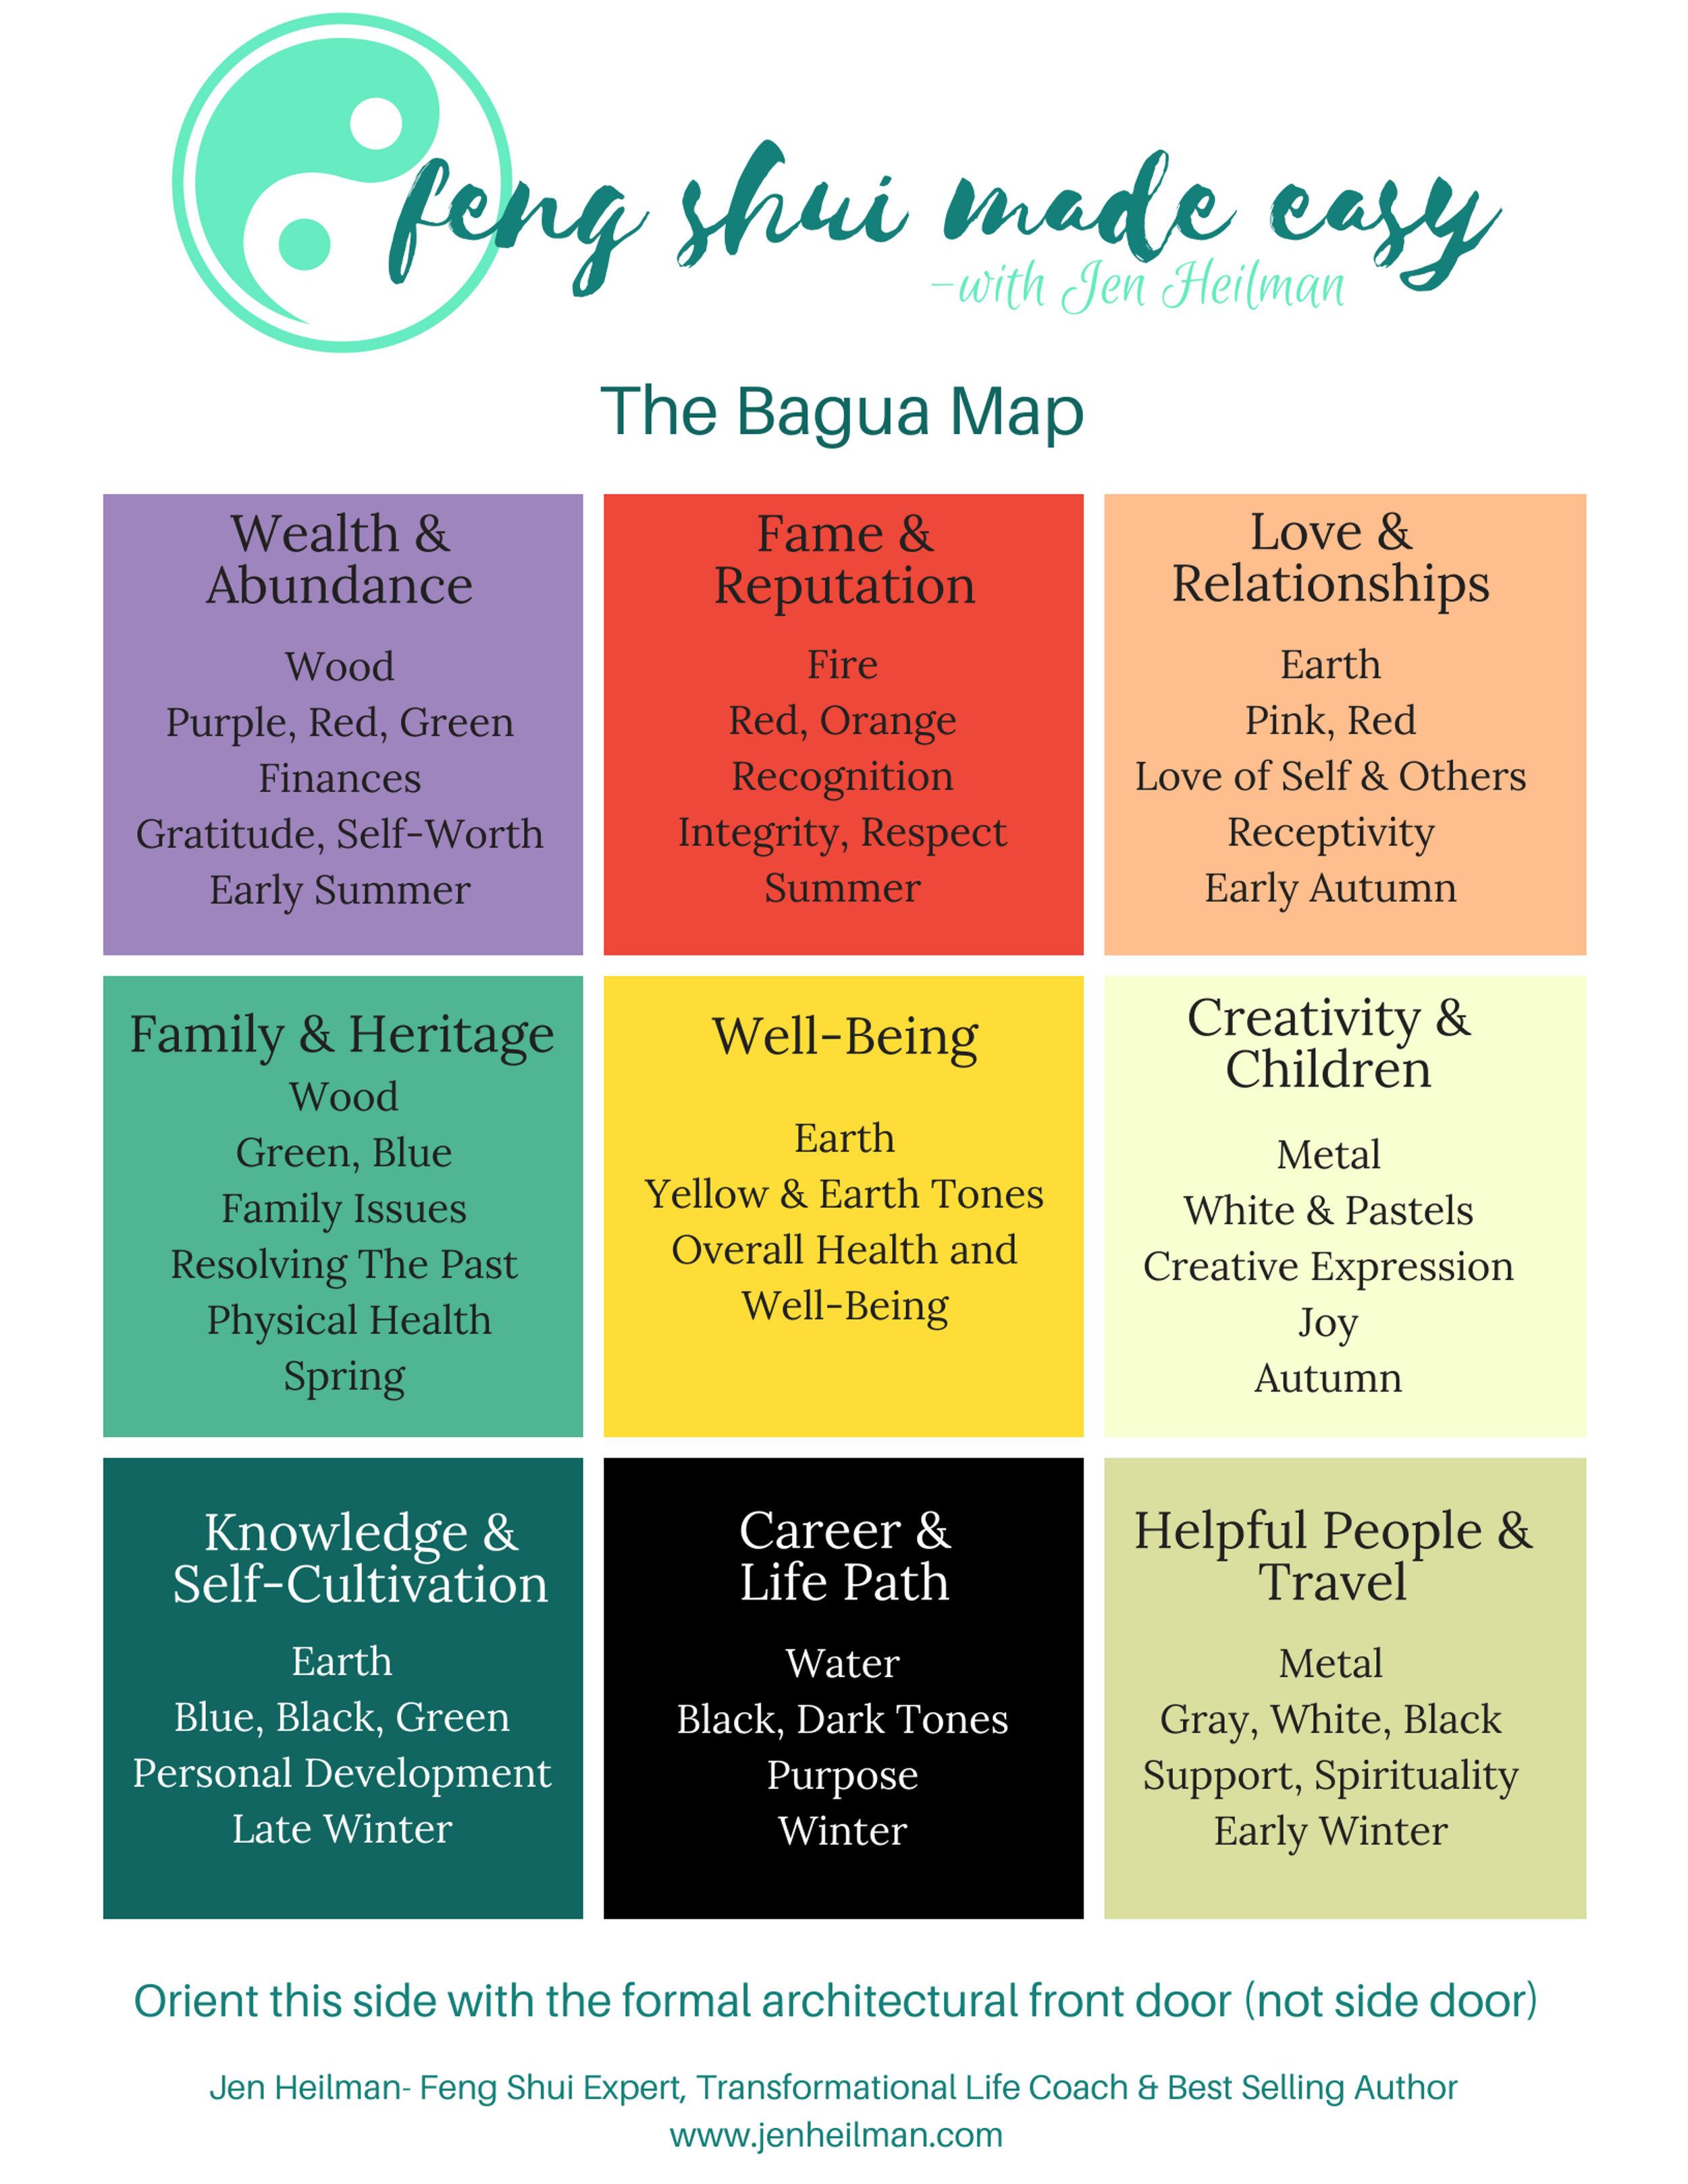 Bagua Map Image Feng Shui Made Easy with Jenheilman.jpg